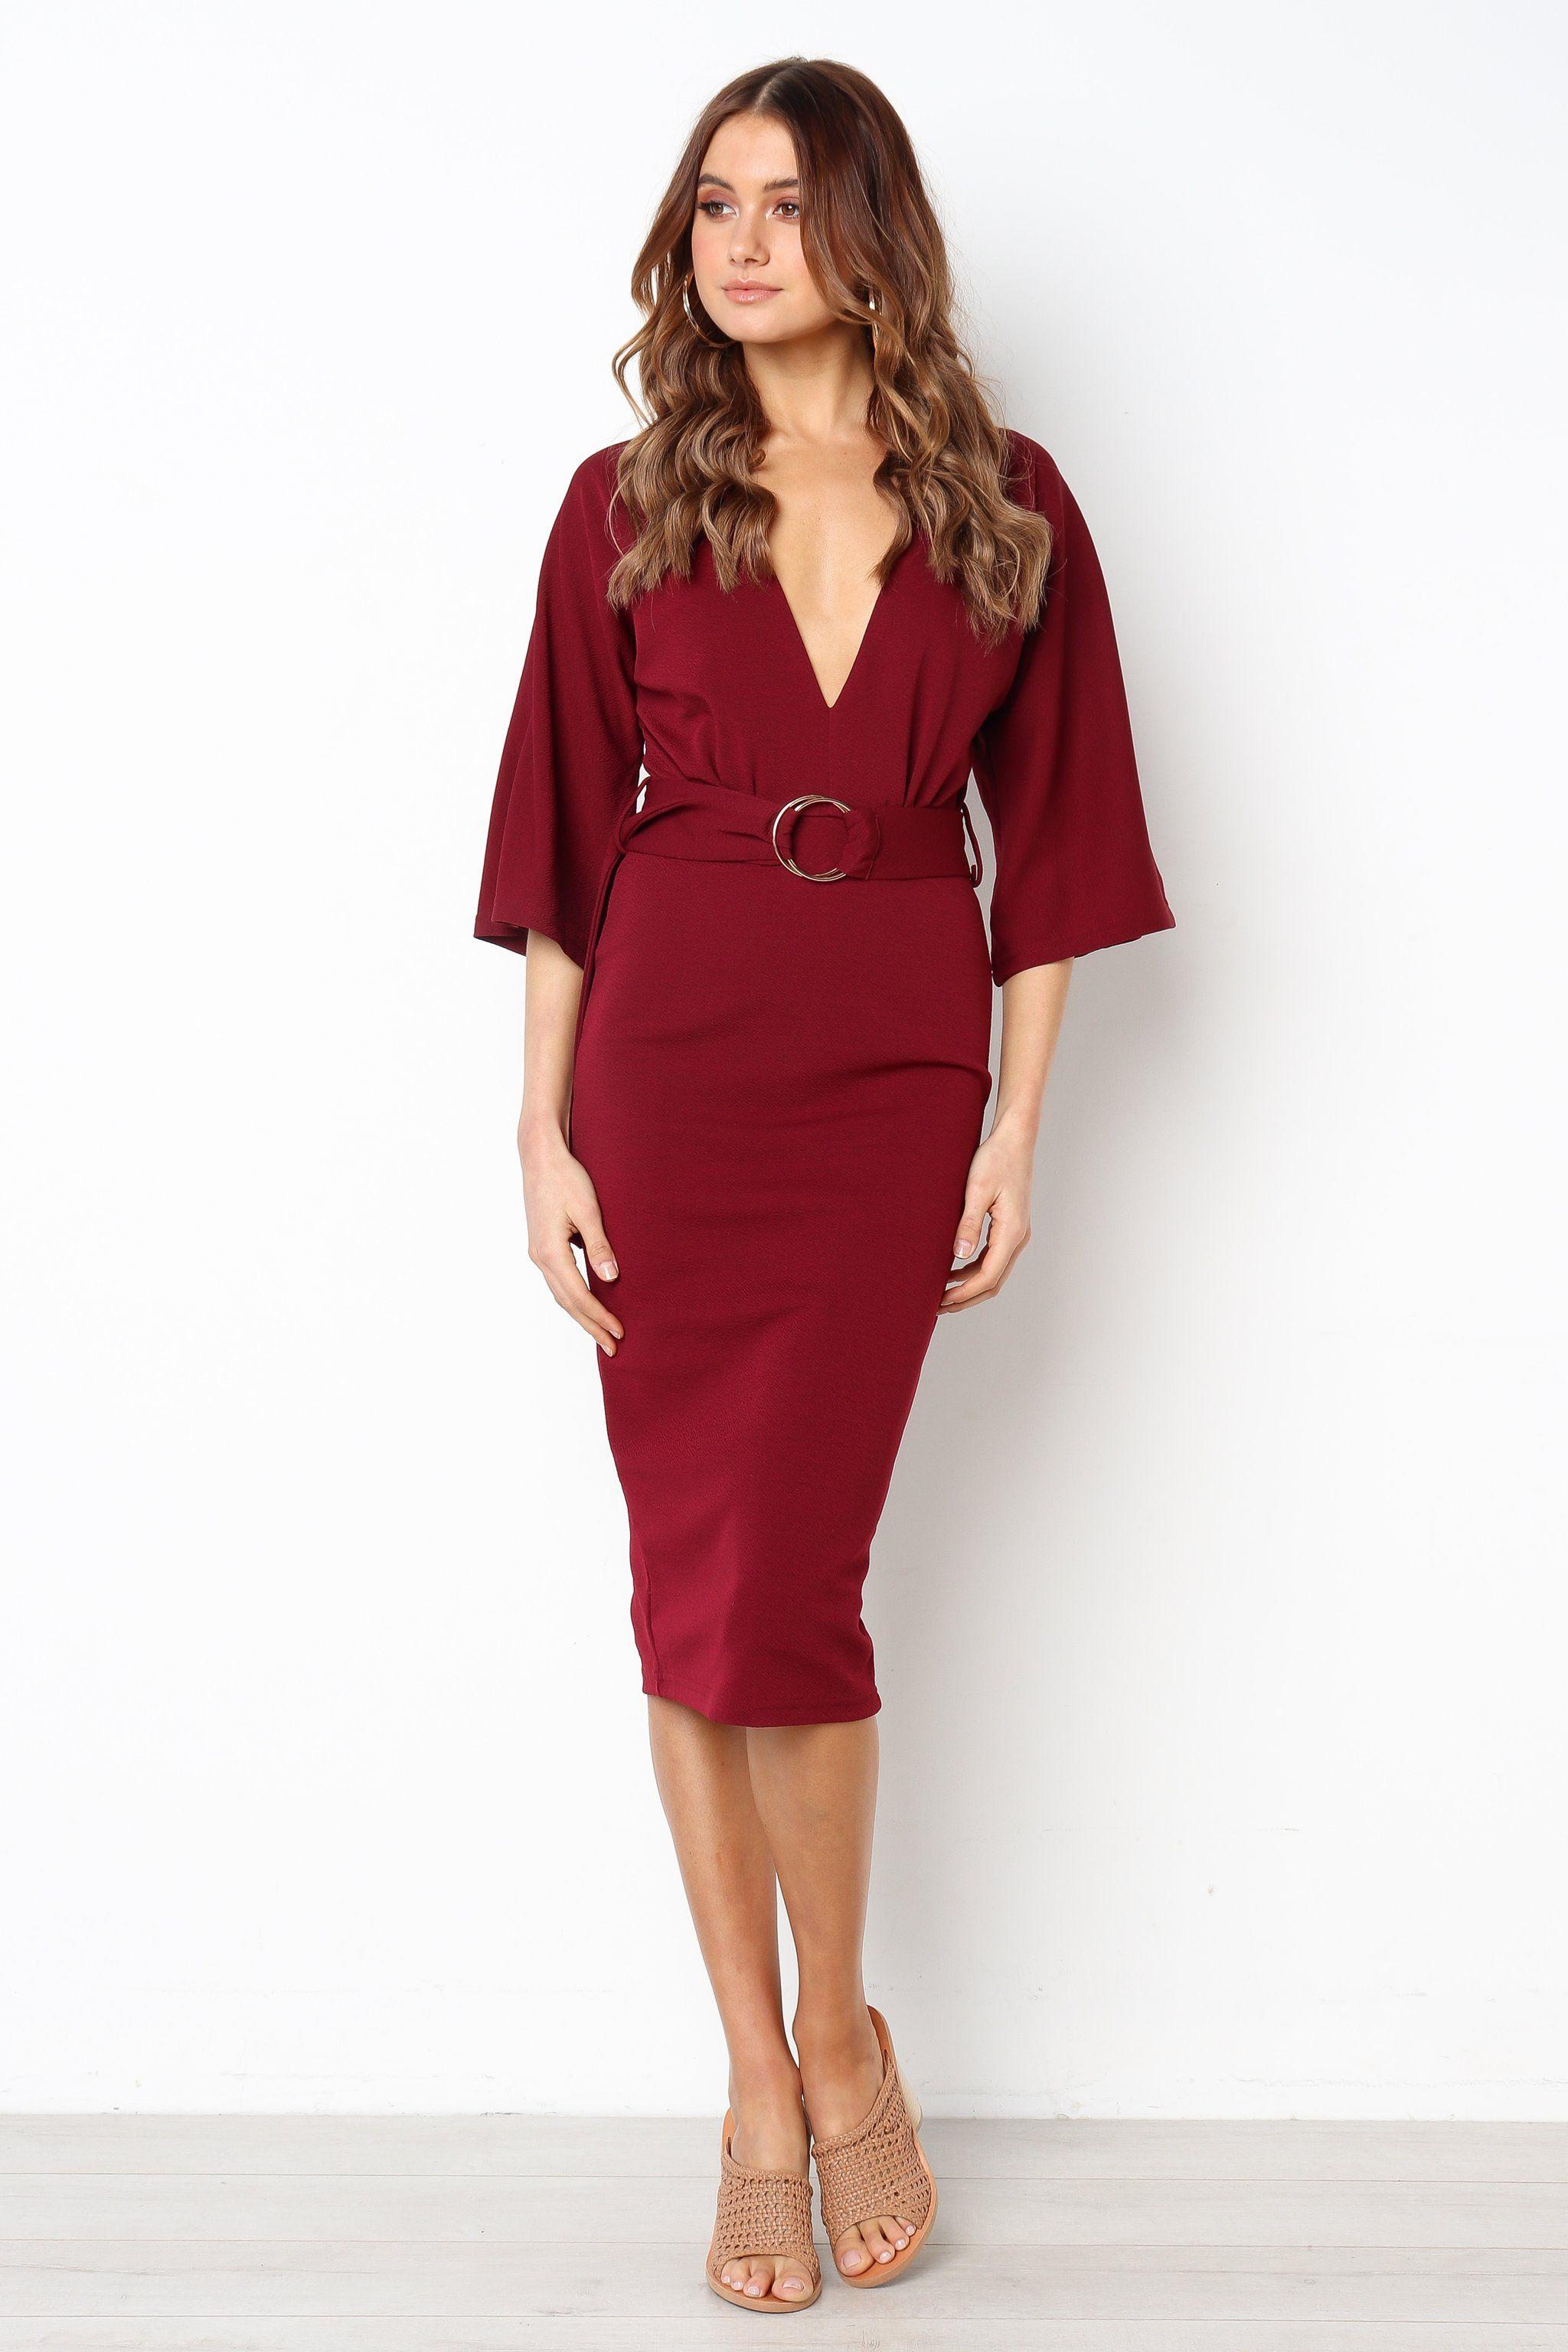 433097310c Sarita Dress - Wine